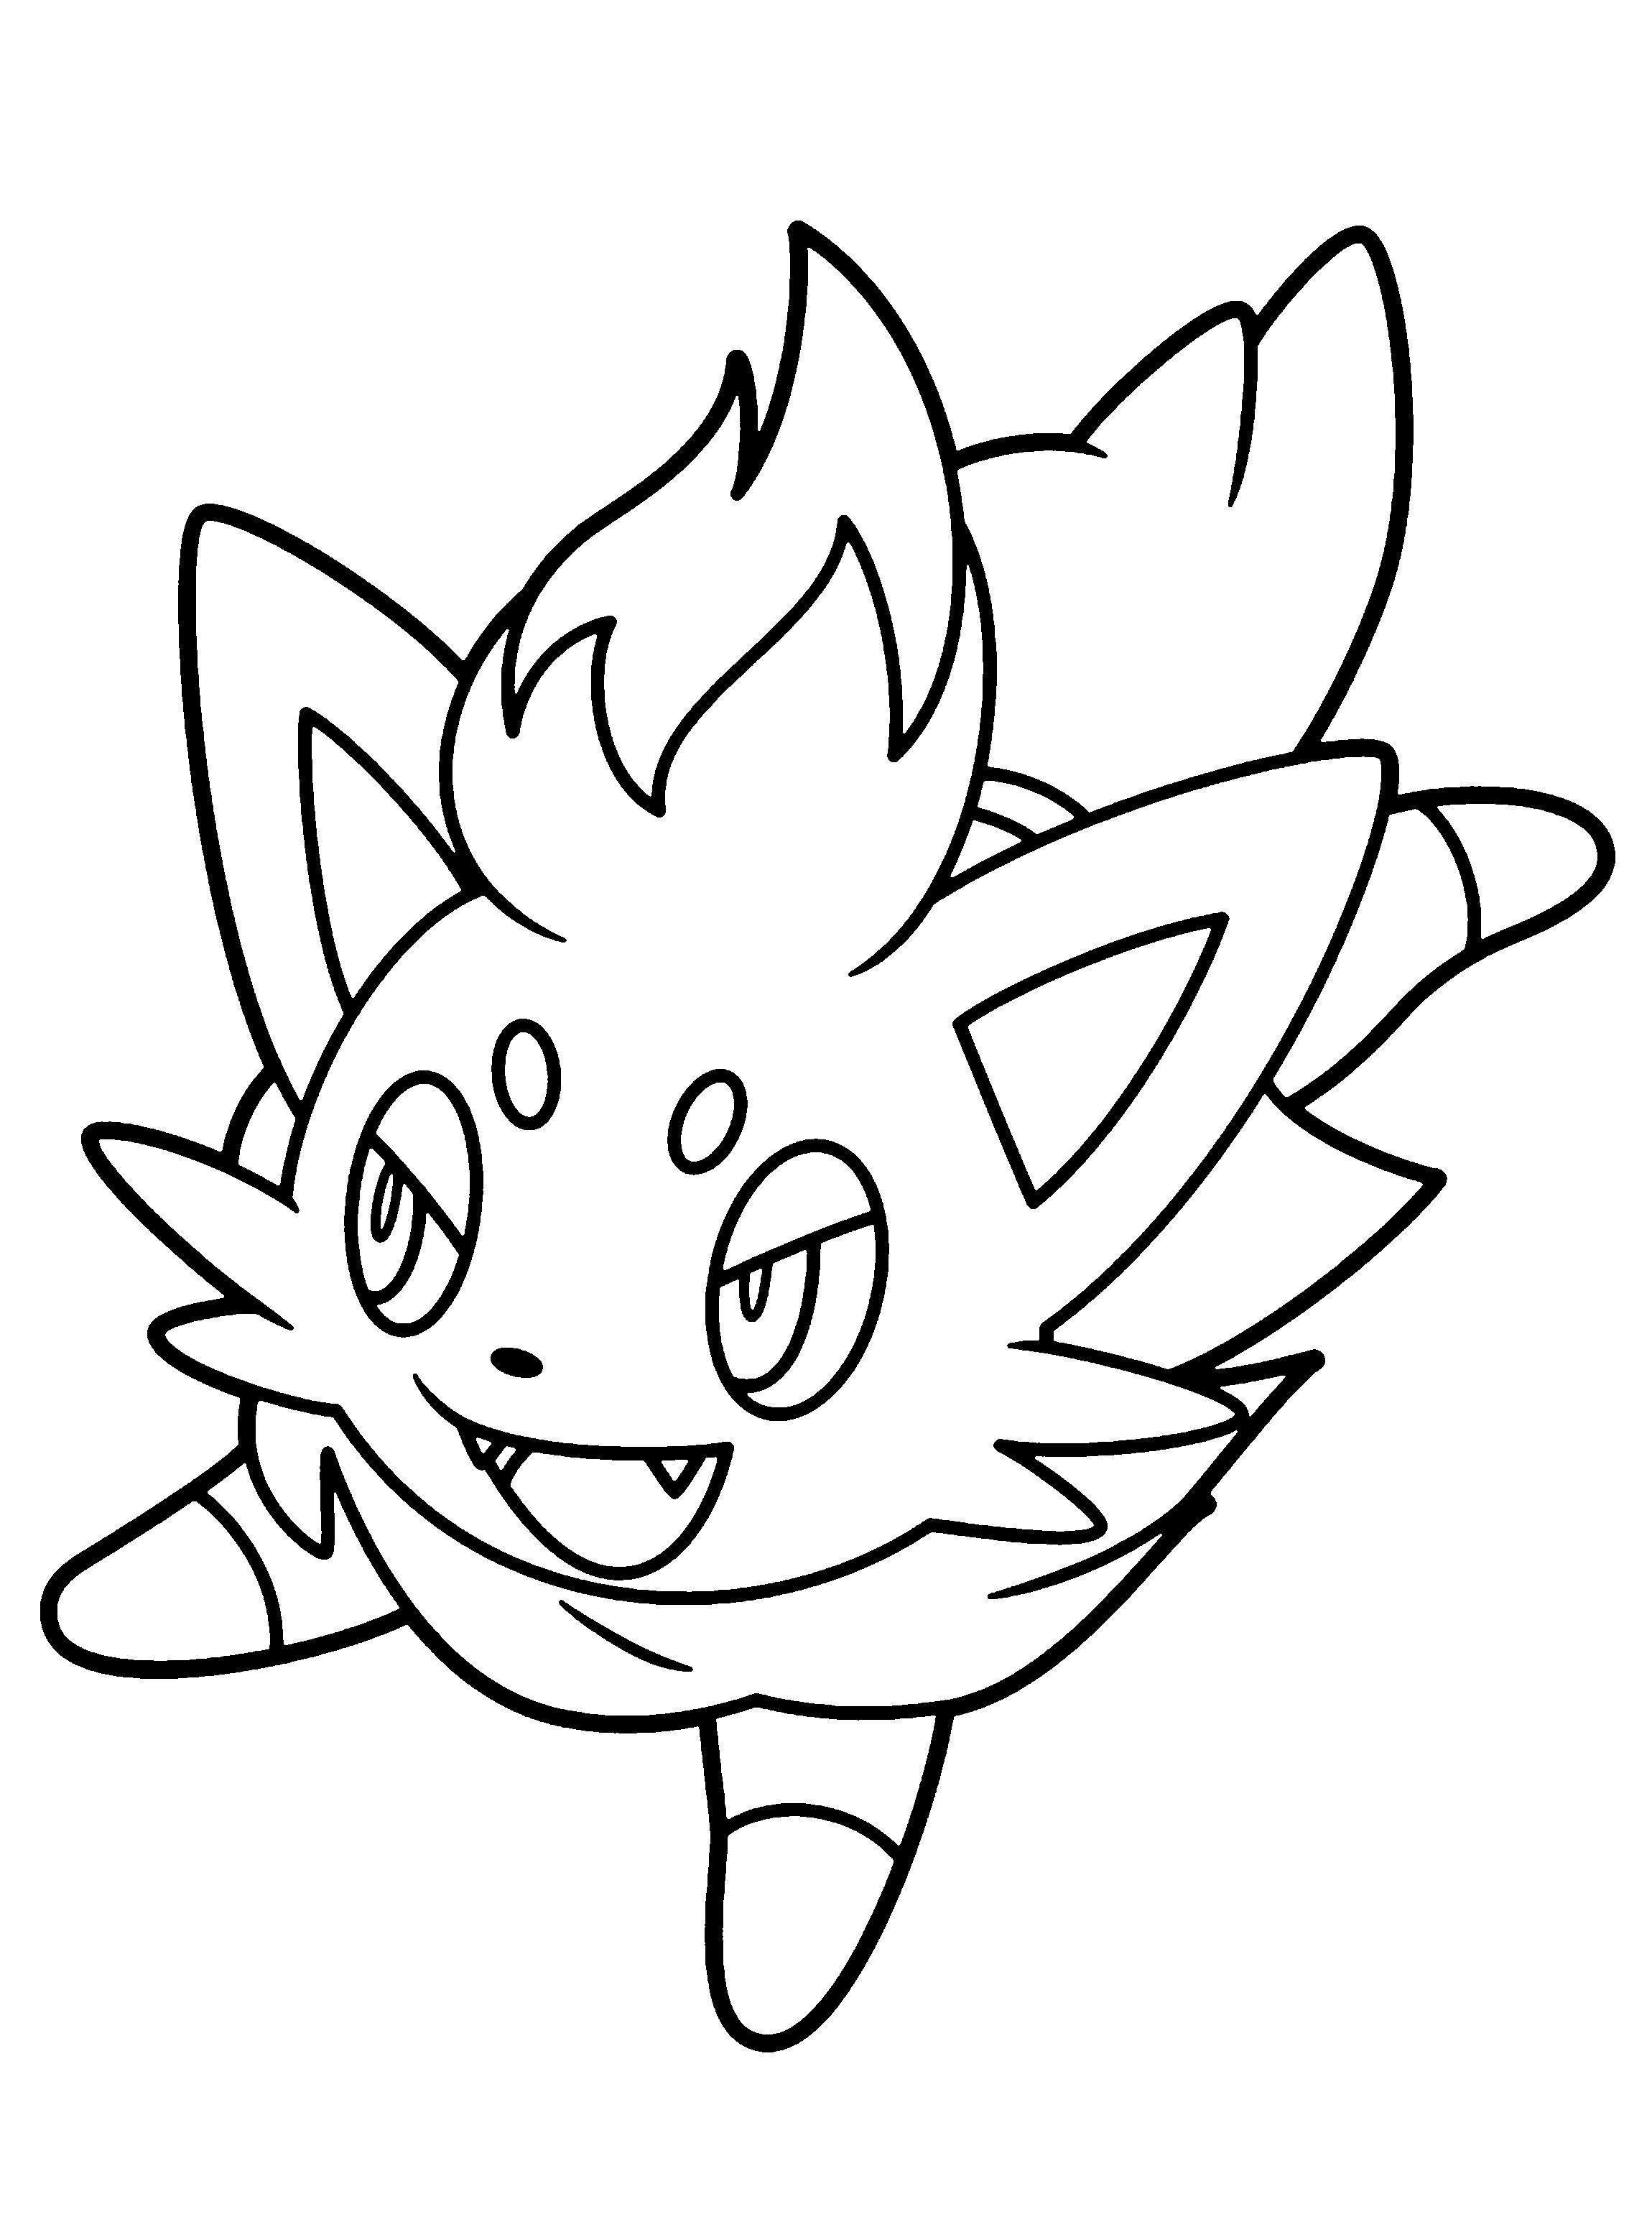 51 Coloriage Pokemon Zorua Imprimer Pokemon Coloring Horse Coloring Pages Pokemon Coloring Pages [ 3100 x 2300 Pixel ]